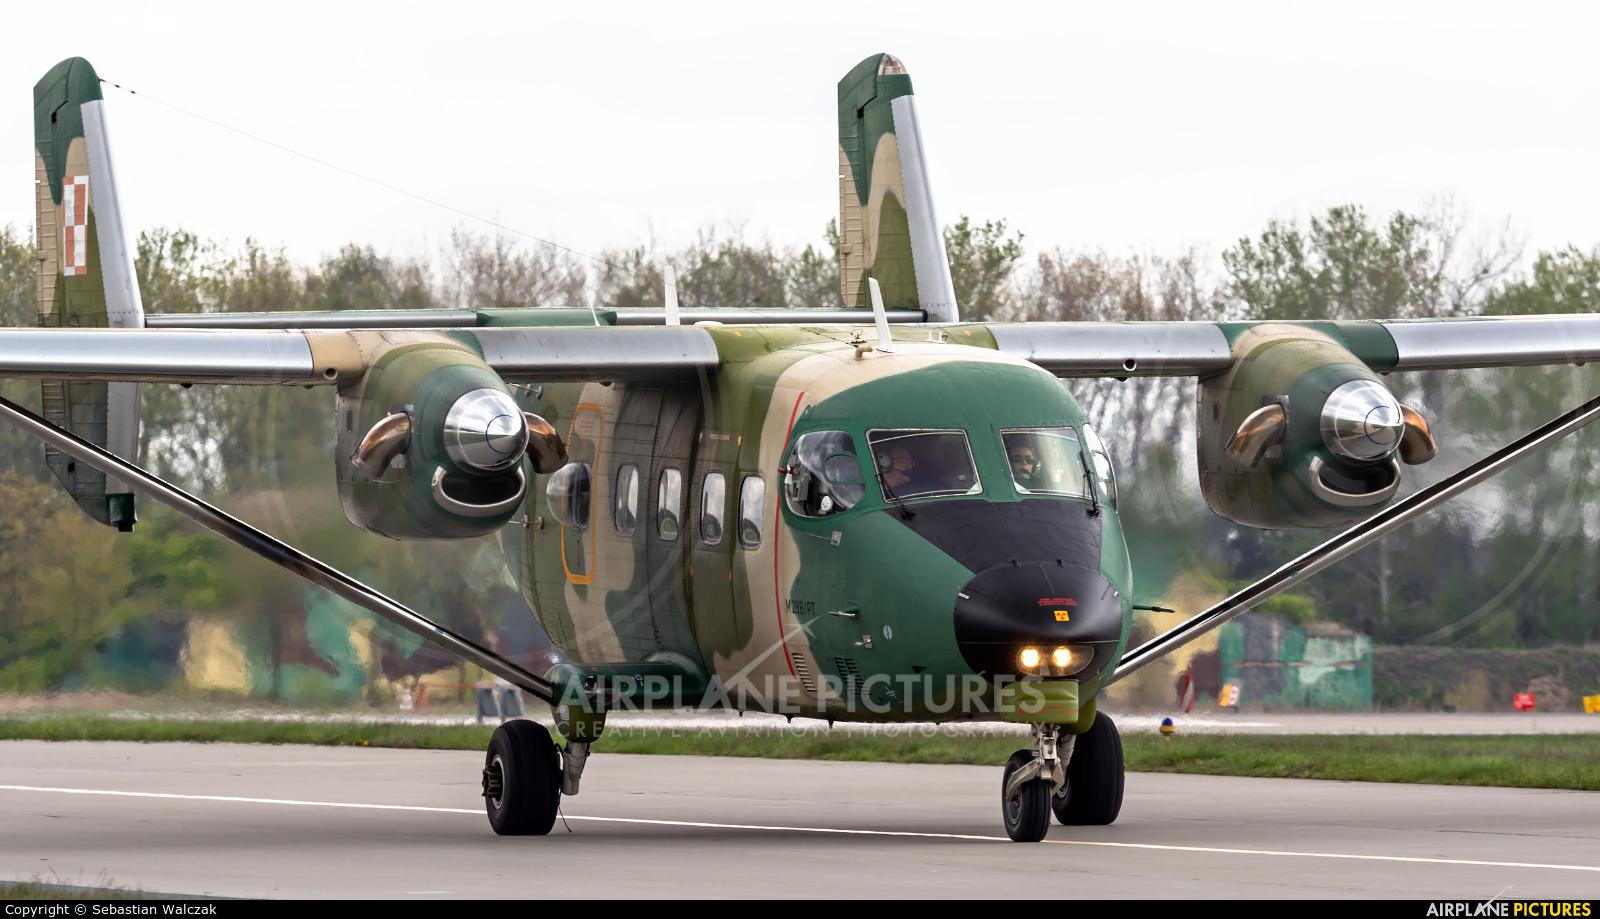 Poland - Air Force 0215 aircraft at Poznań - Krzesiny